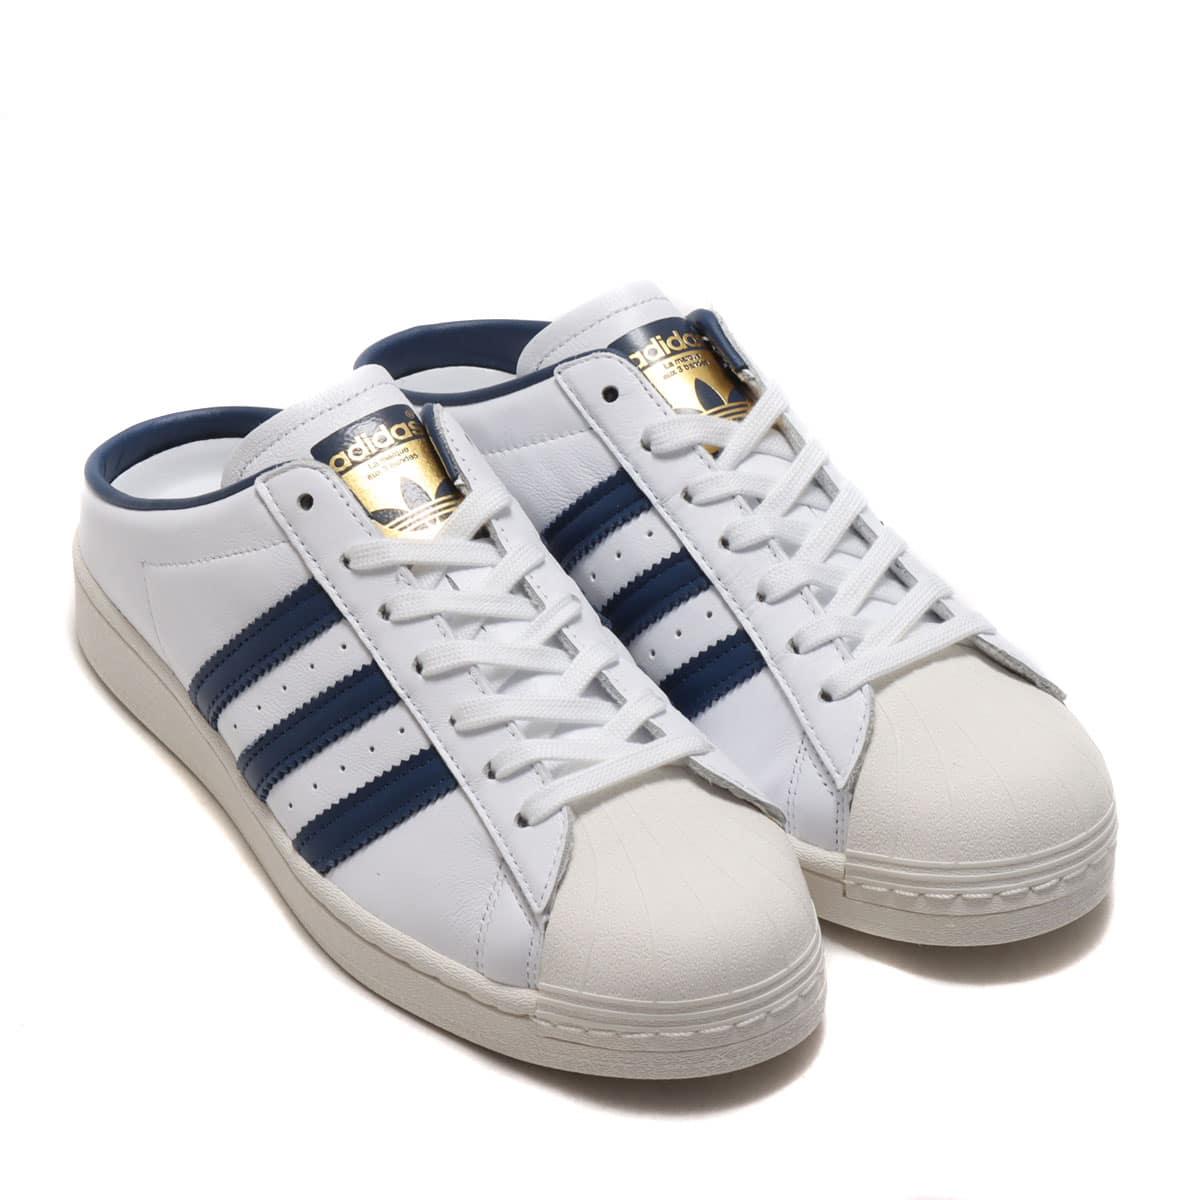 adidas SST MULE FOOTWEAR WHITE/NIGHT MARINE/GOLD METALLIC 21SS-I_photo_large